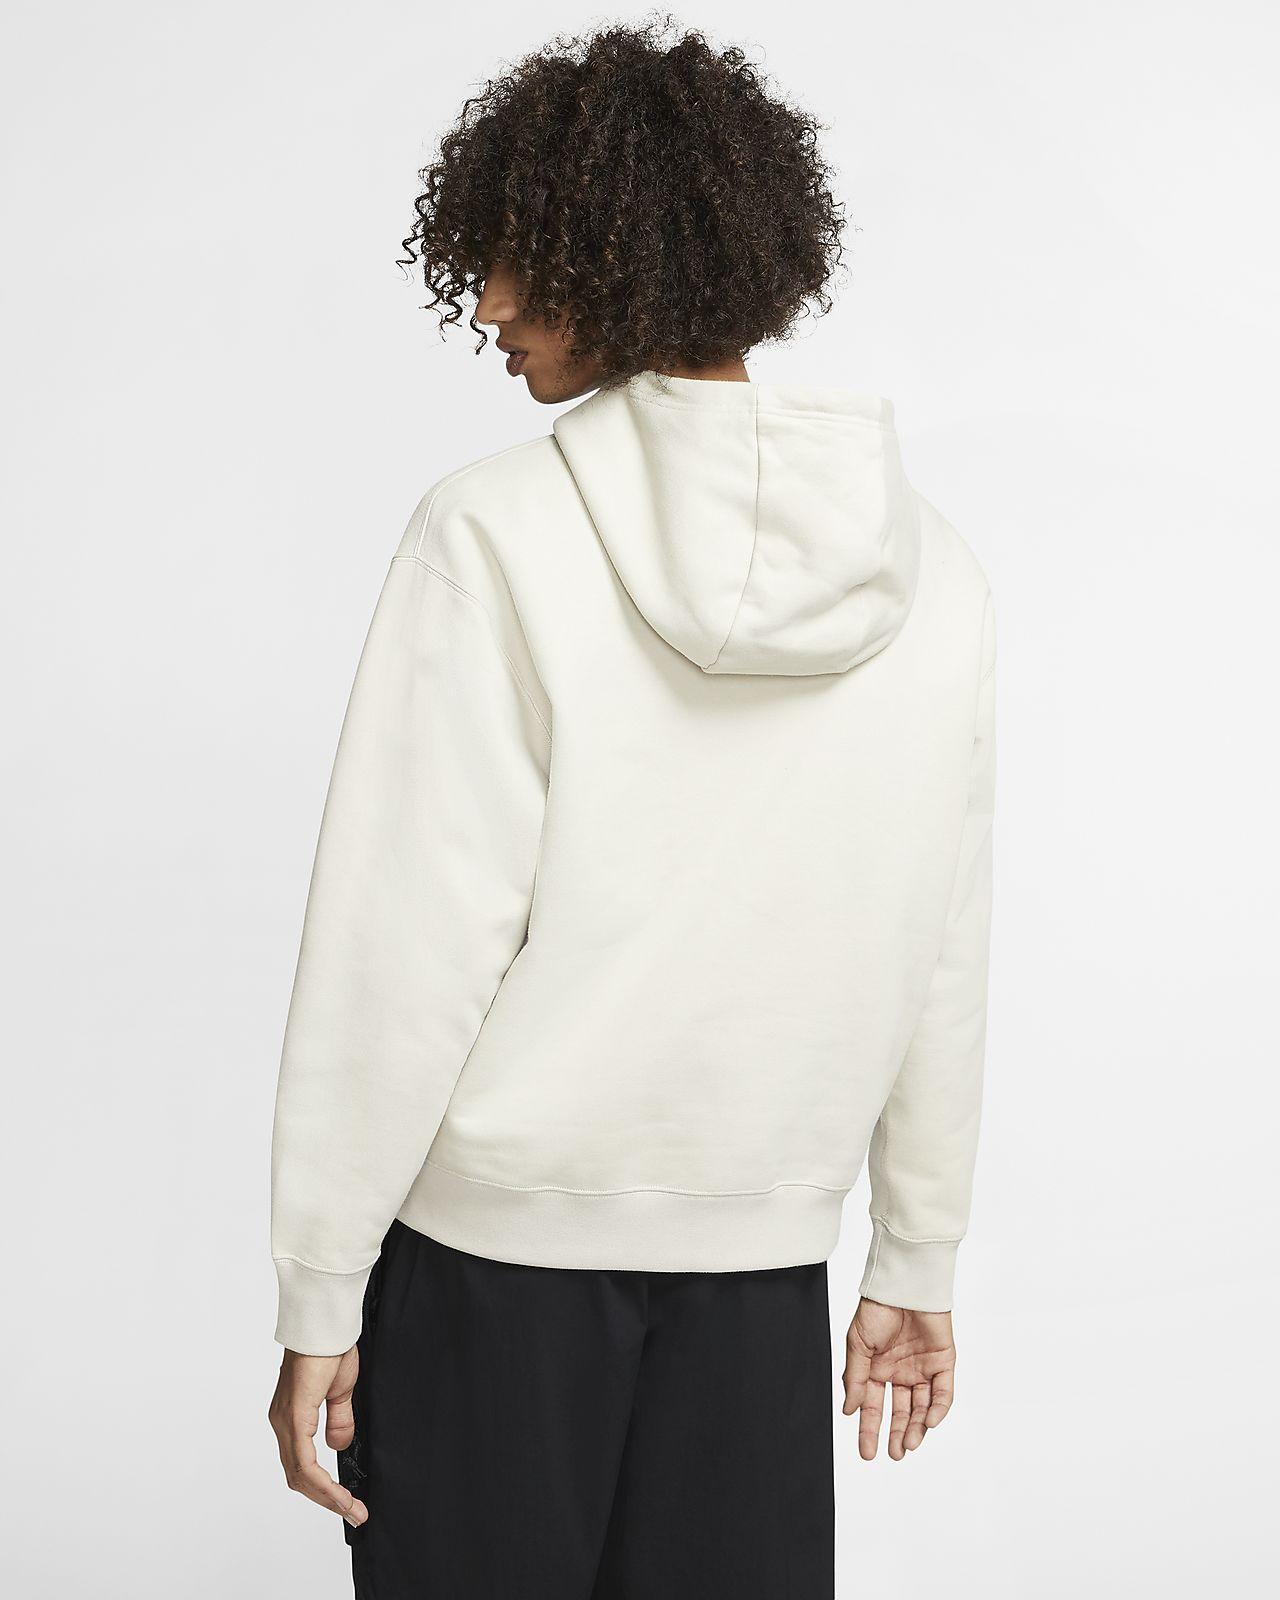 Sanda Romanian Roots Mens Hooded Sweatshirt